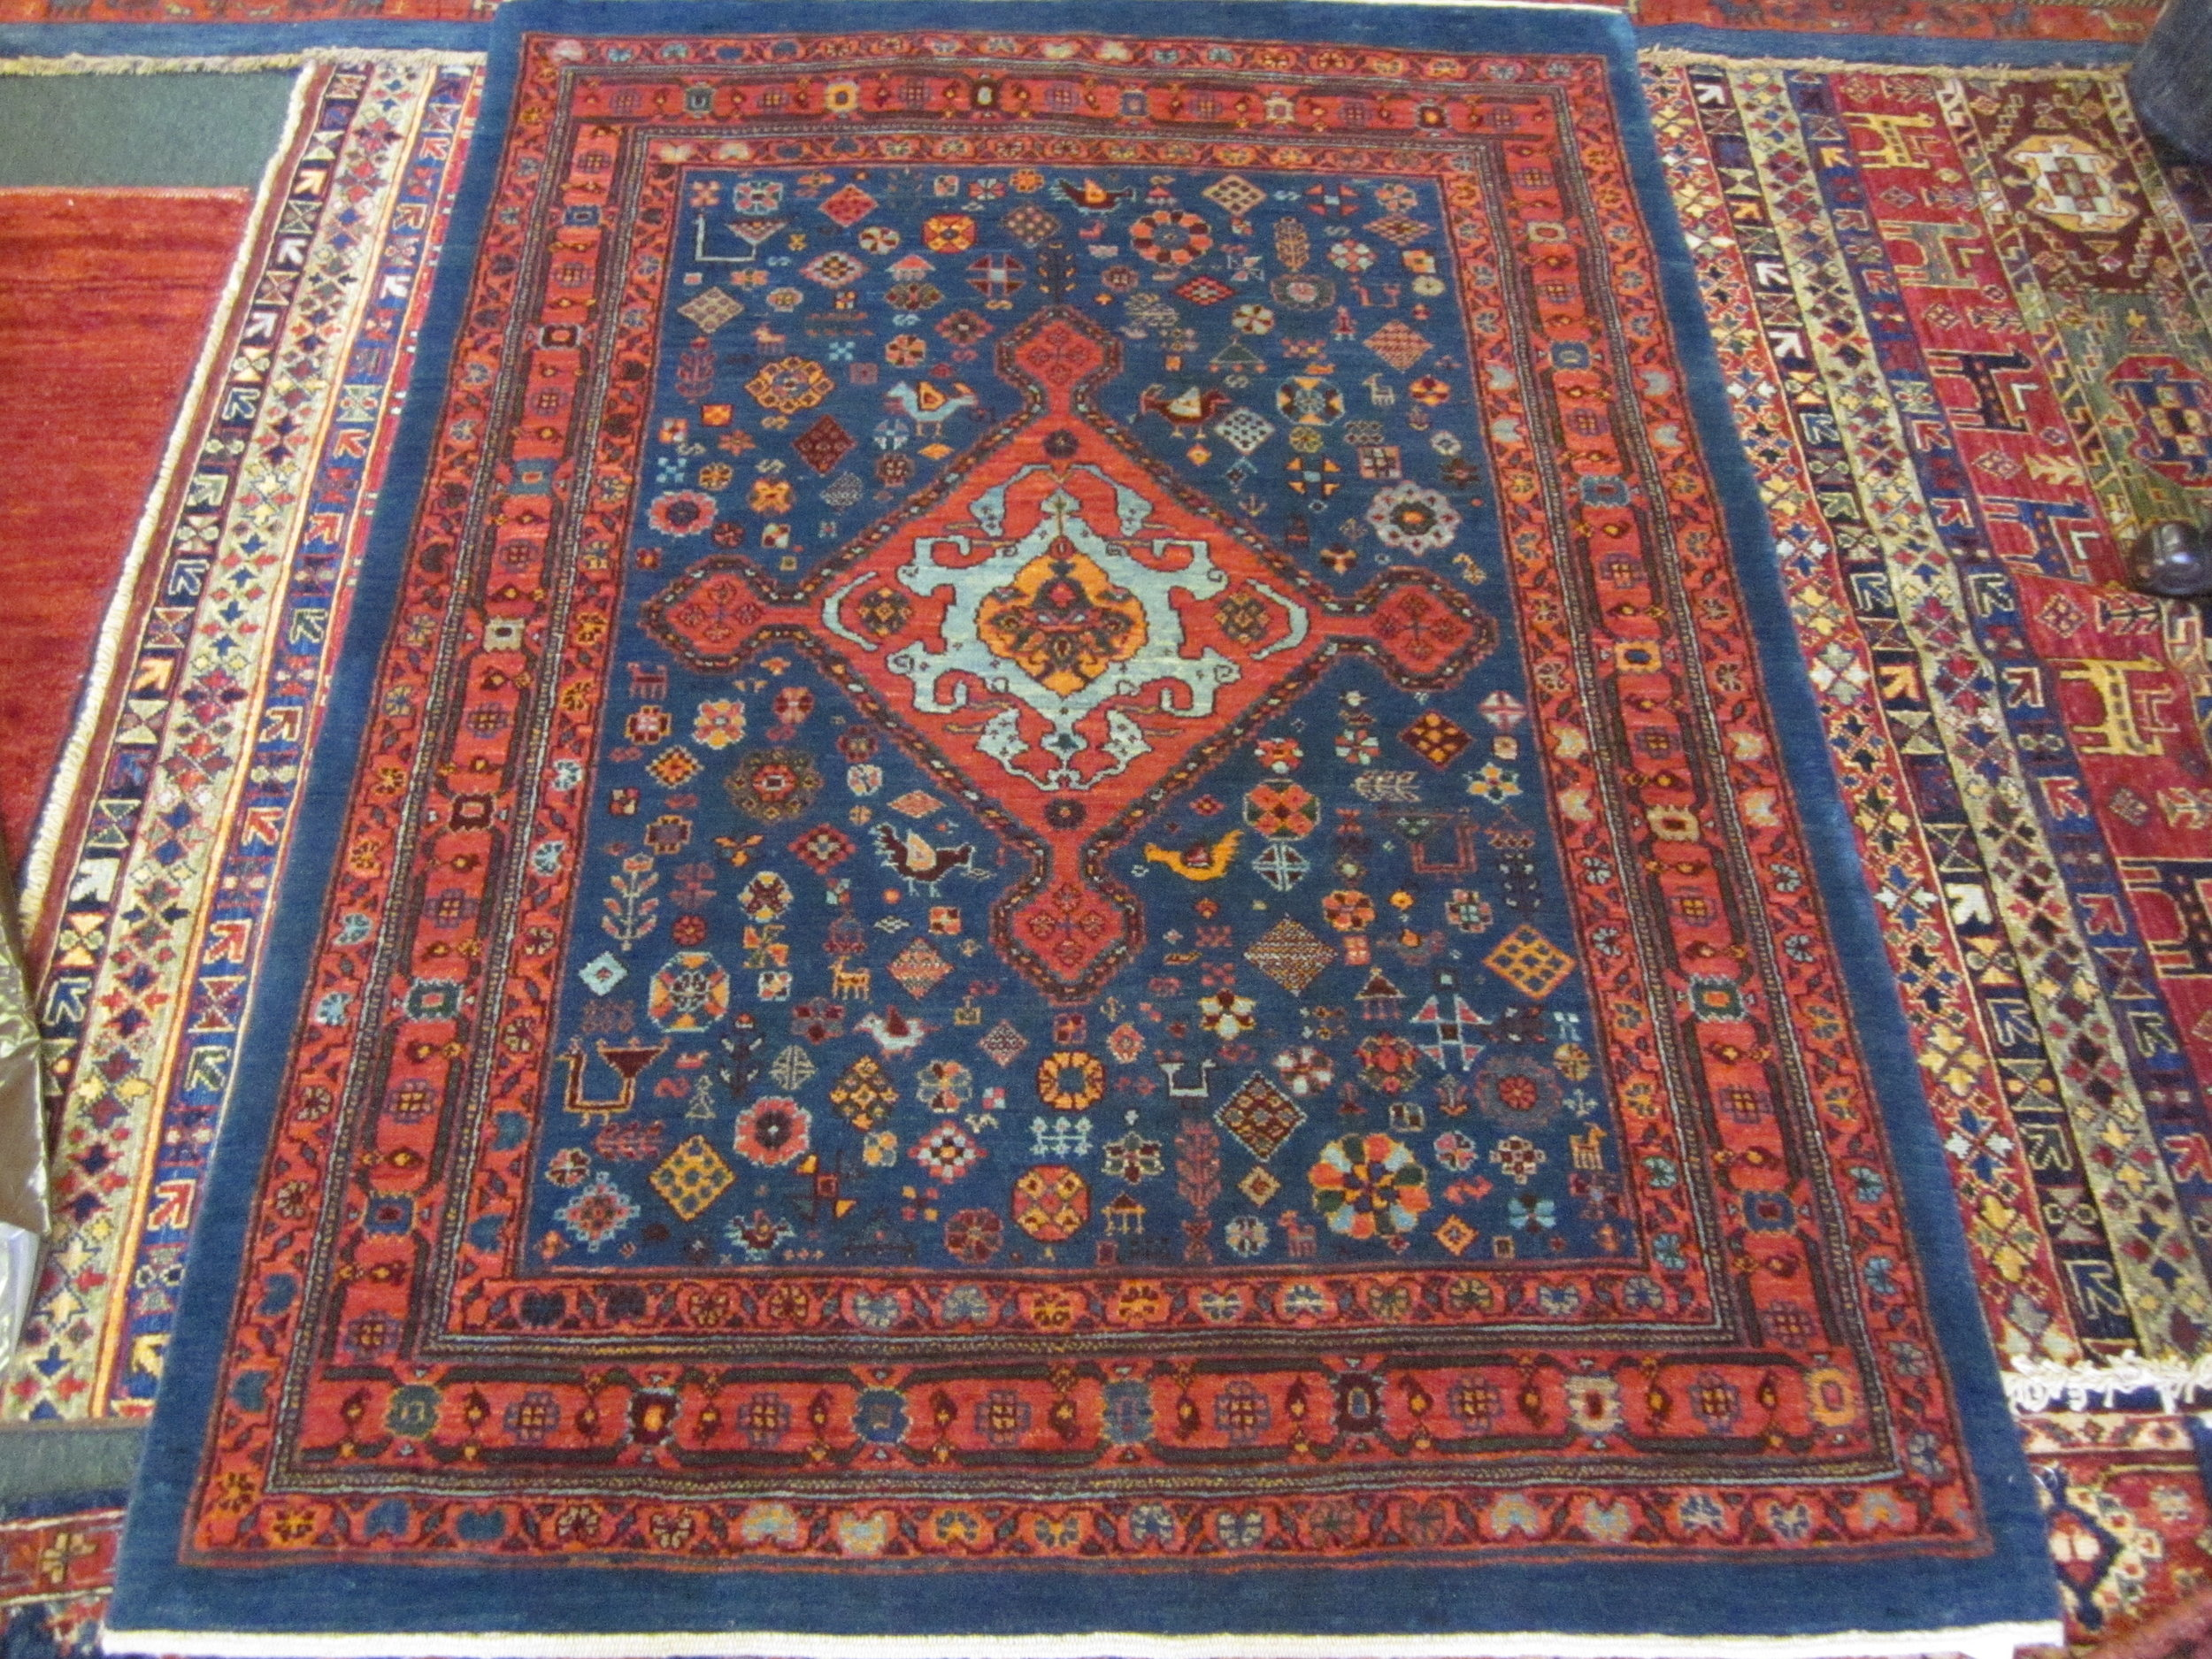 "#39) Beautiful small Qashqai rug in turquoise! 3'5"" x 4'7"""